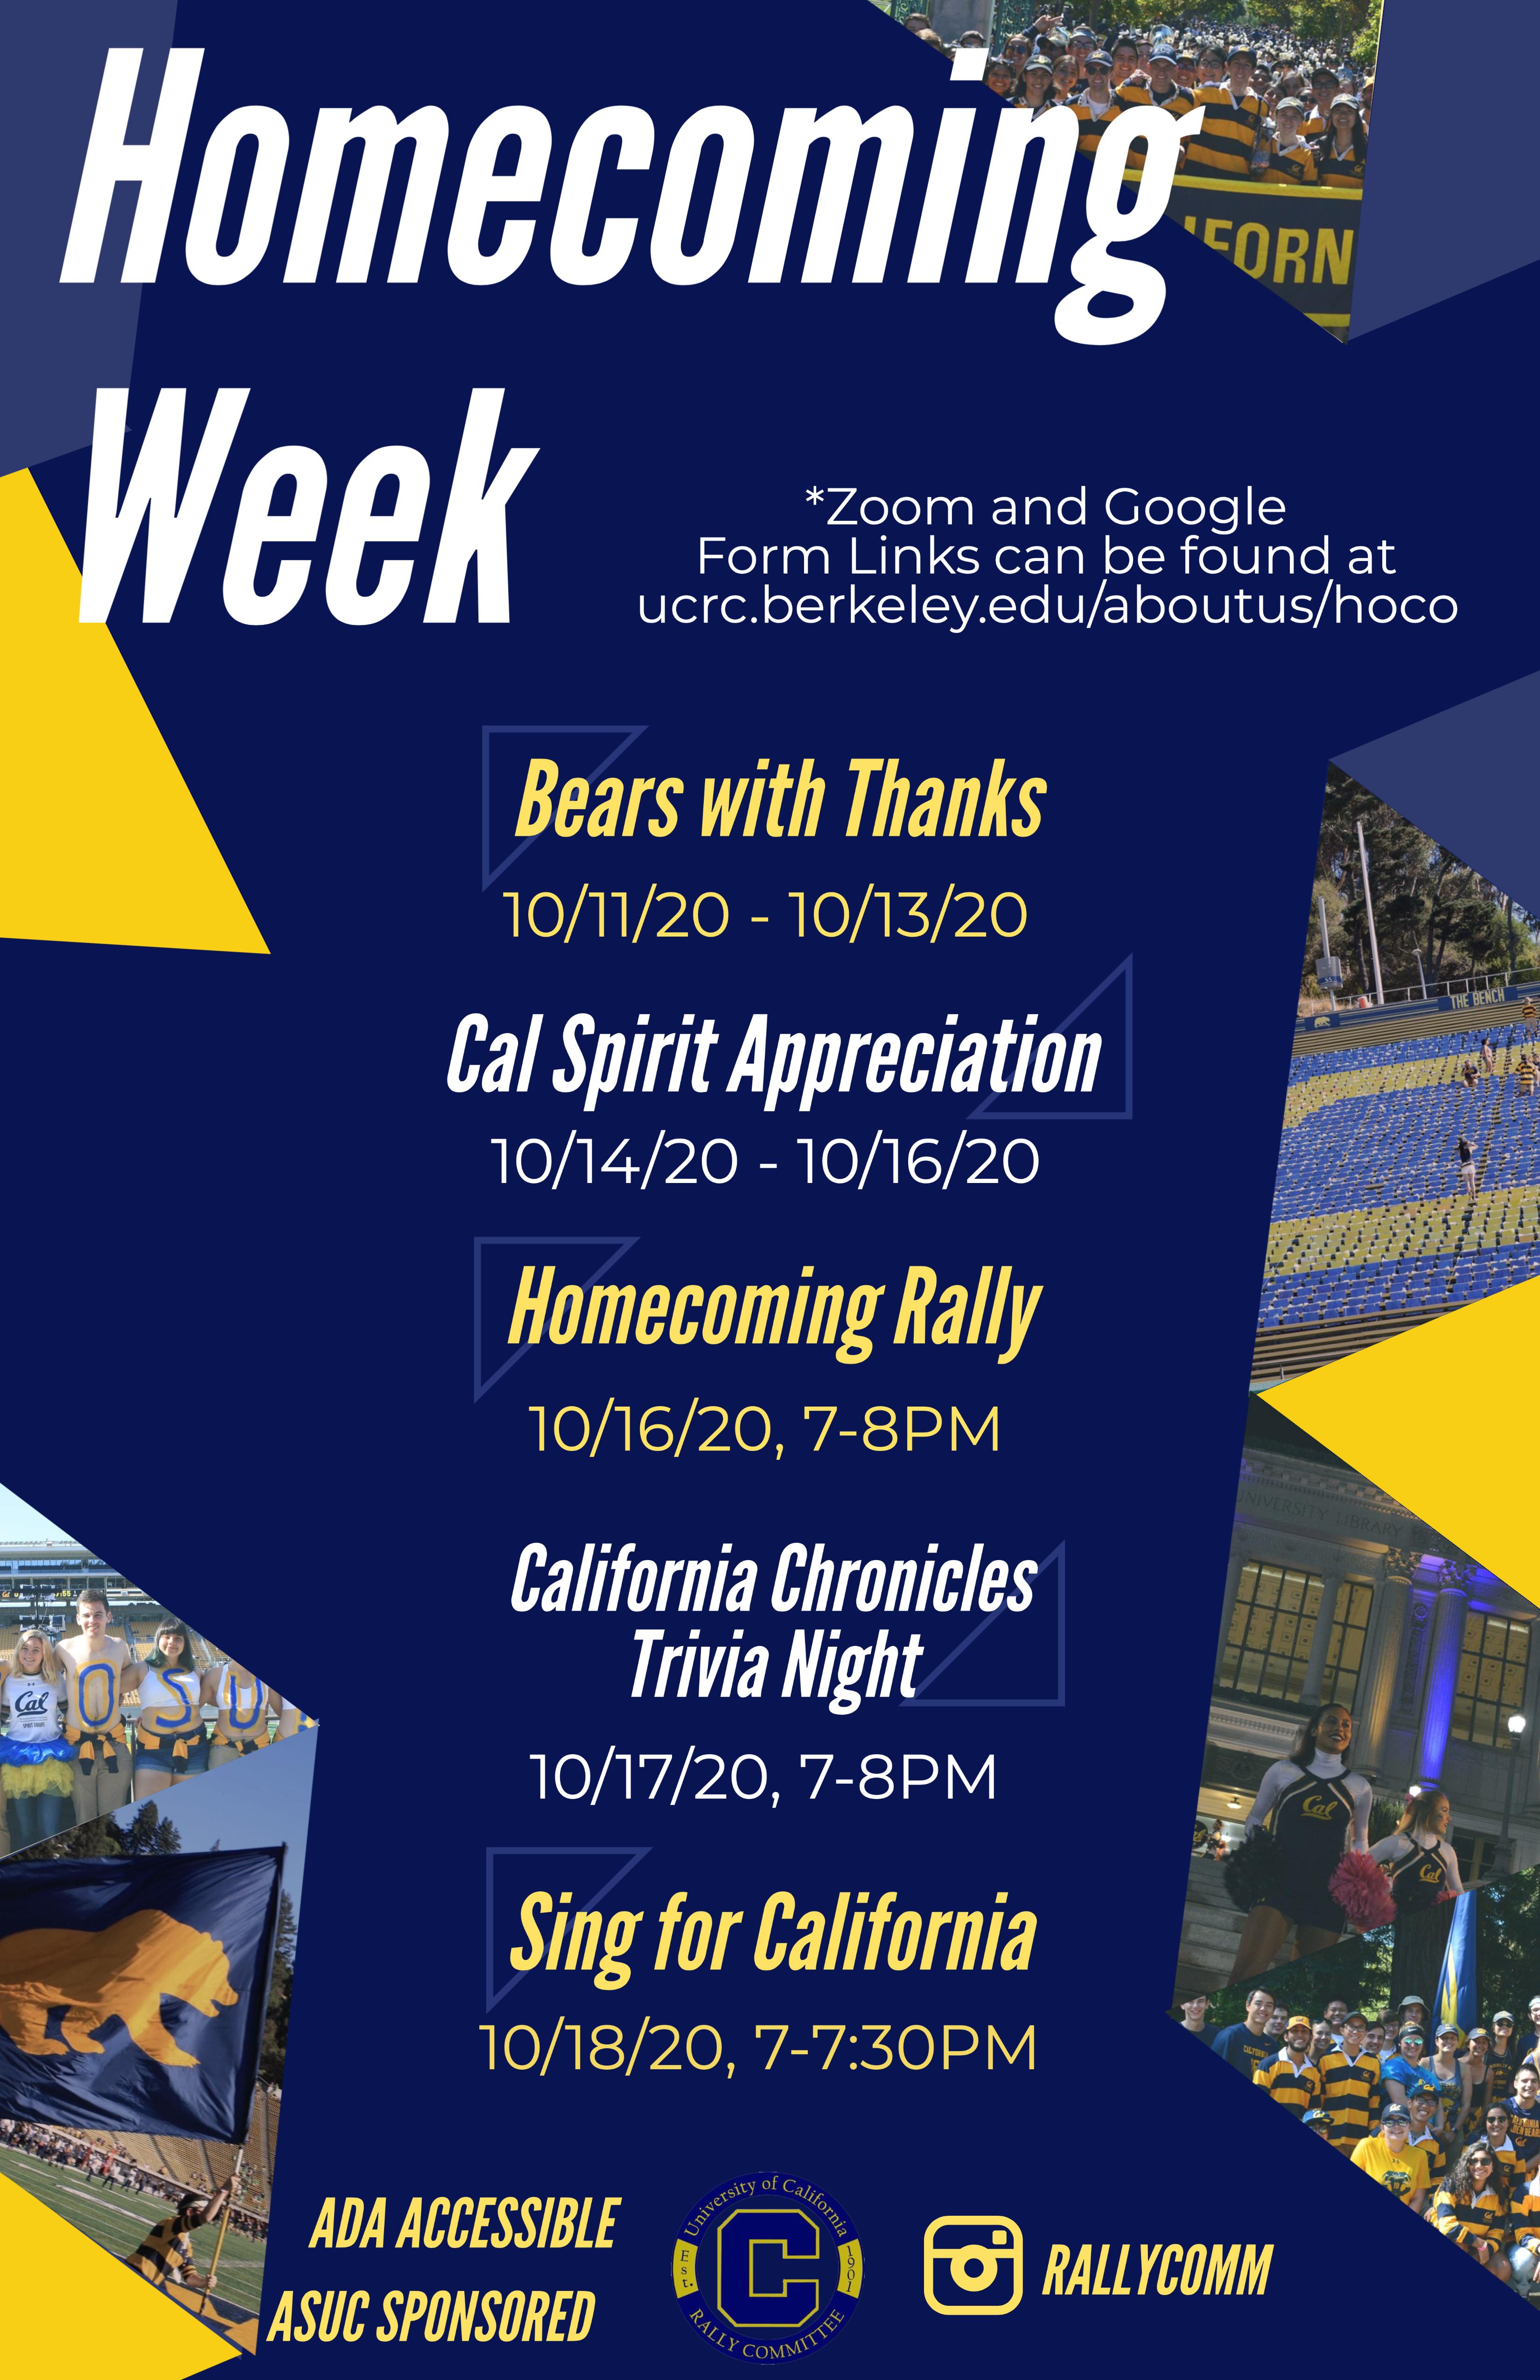 Homecoming Week Poster 2020